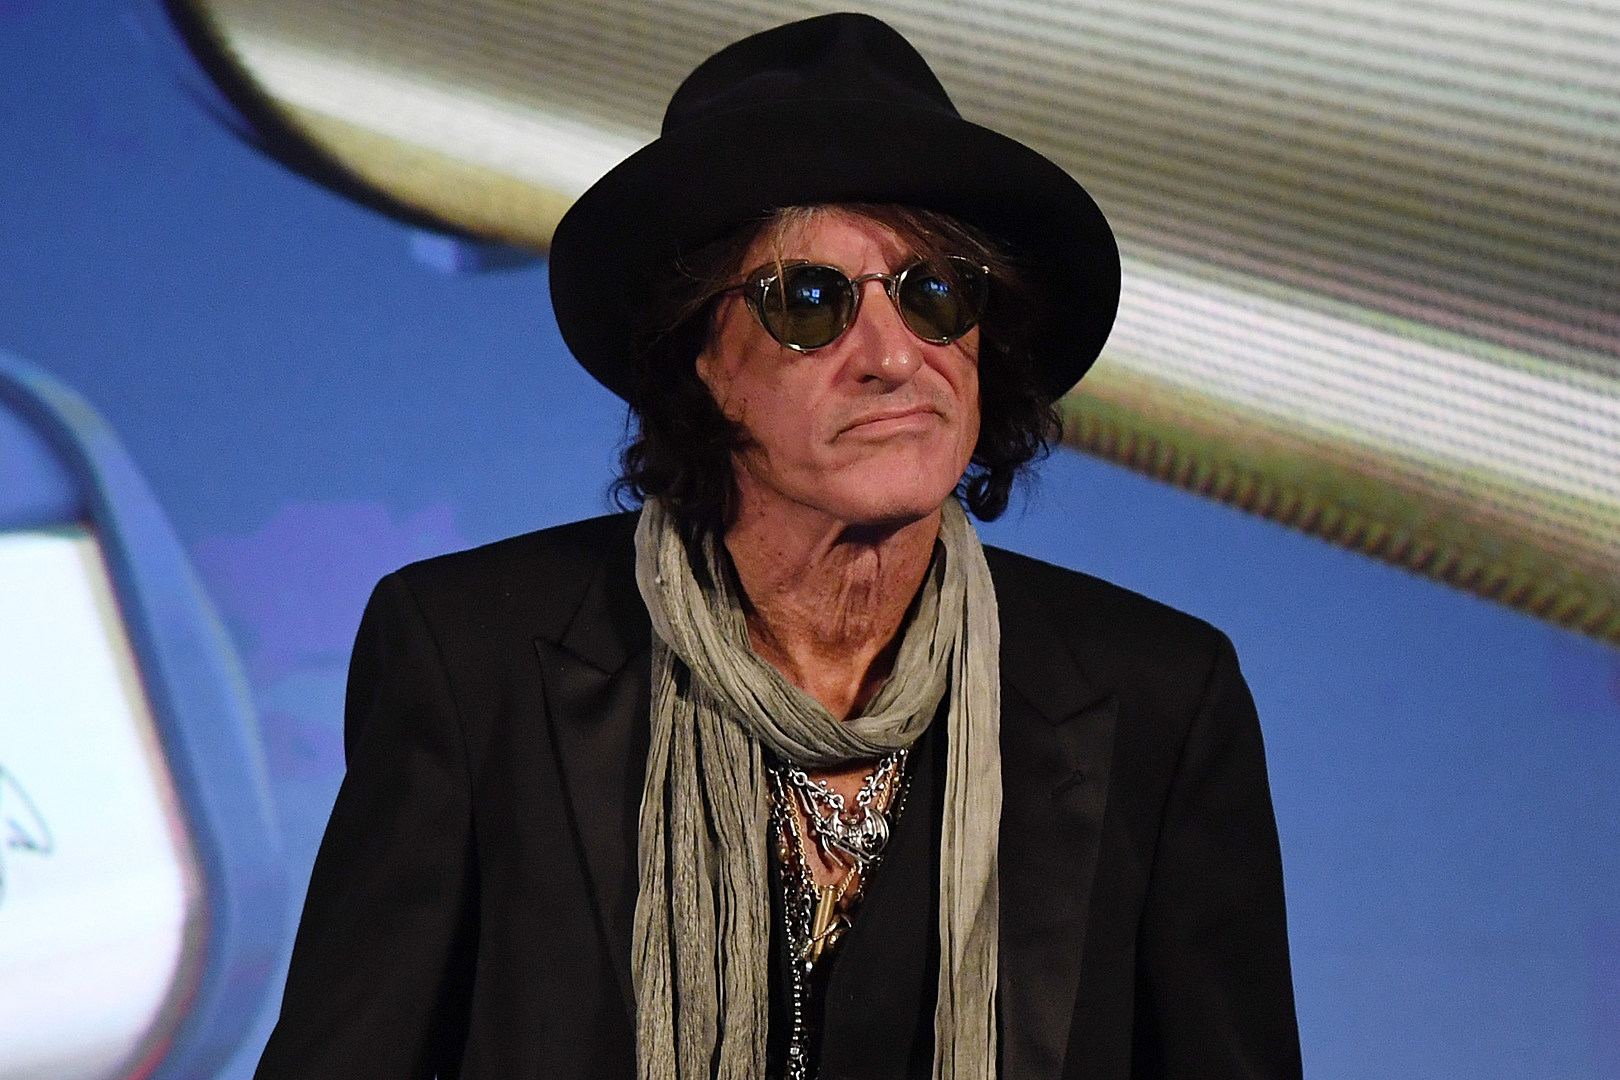 Aerosmith Guitarist Joe Perry 'Alert and Responsive' in Hospital